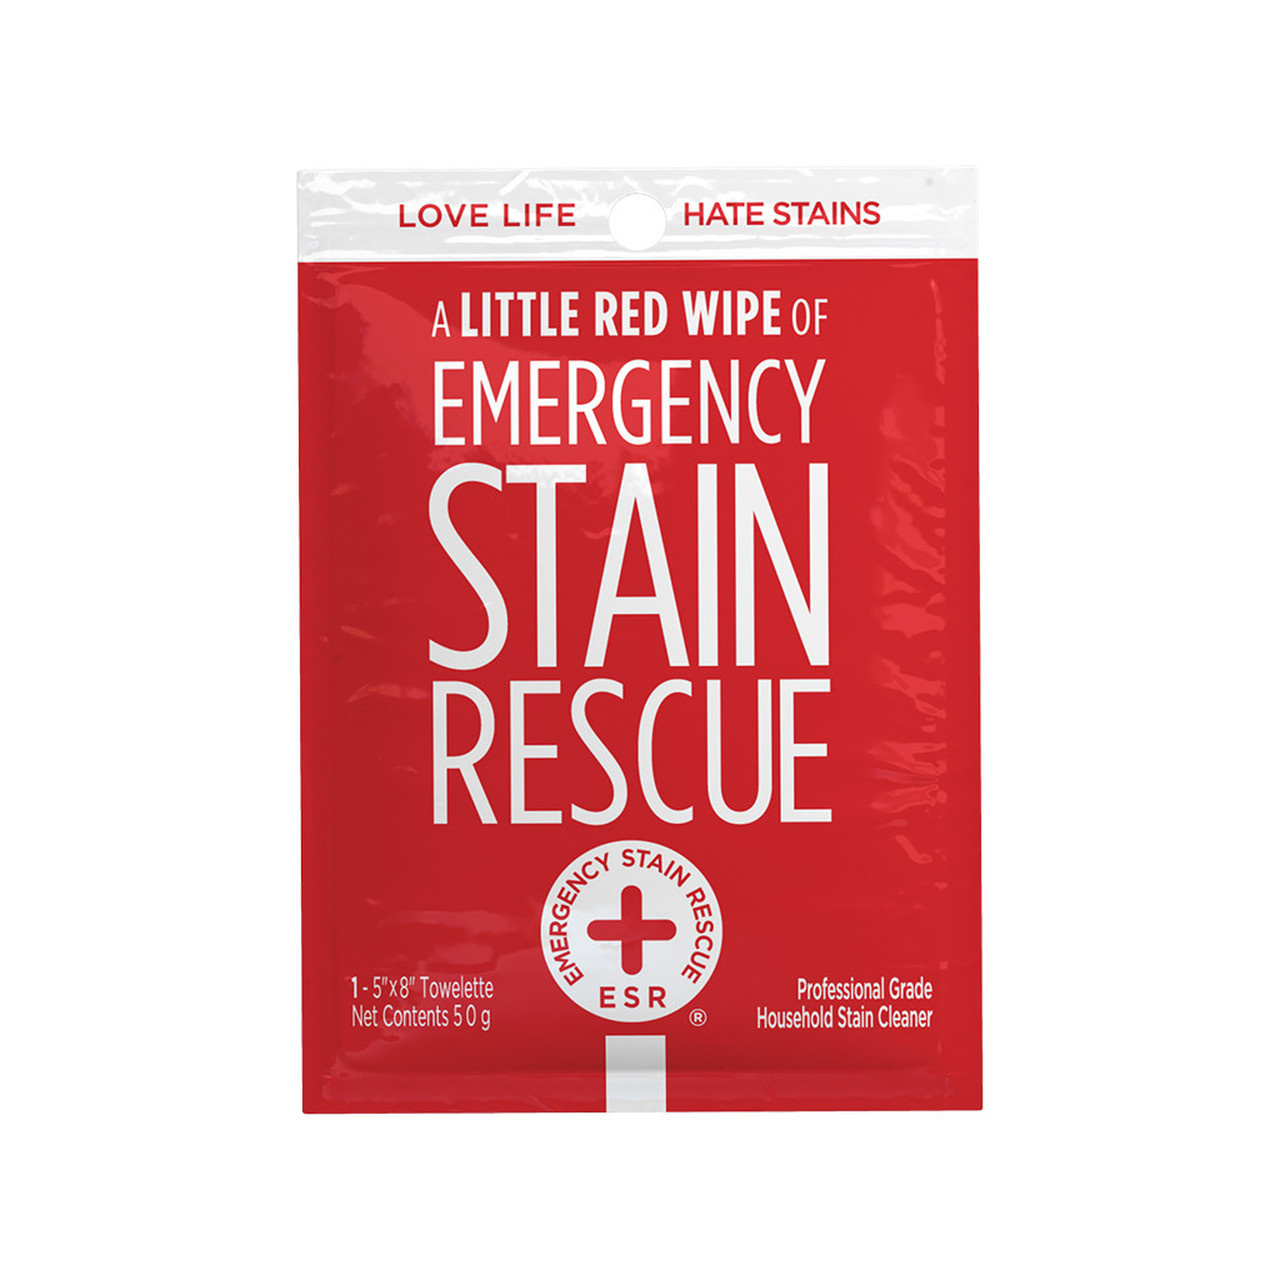 Emergency Stain Rescue Emergency Stain Rescue Wipe